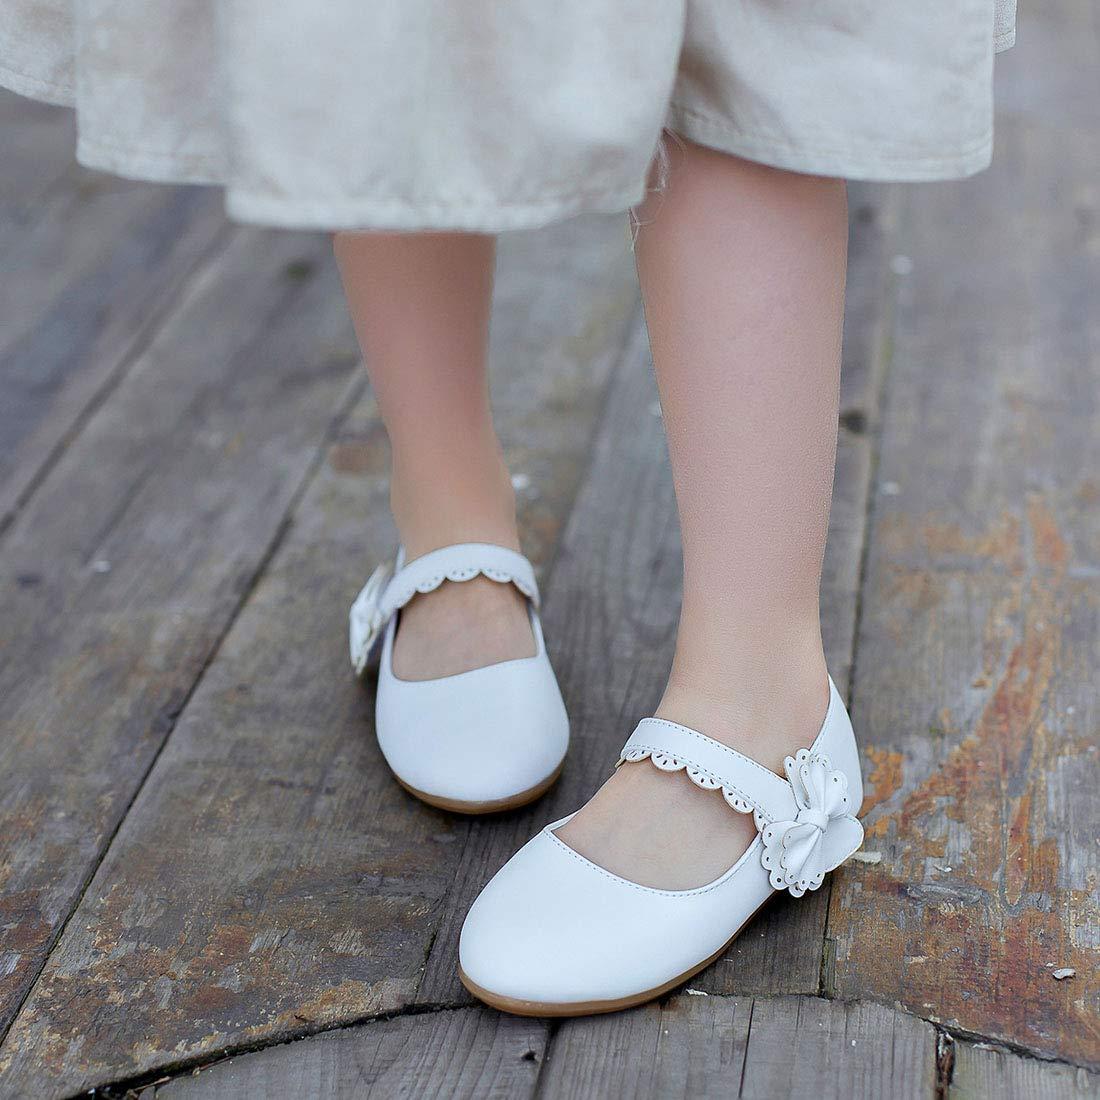 JTENGYAO Kid Girls Ballet Flats Shoes Bow Jane Mary Bridesmaid Wedding Princess Dress